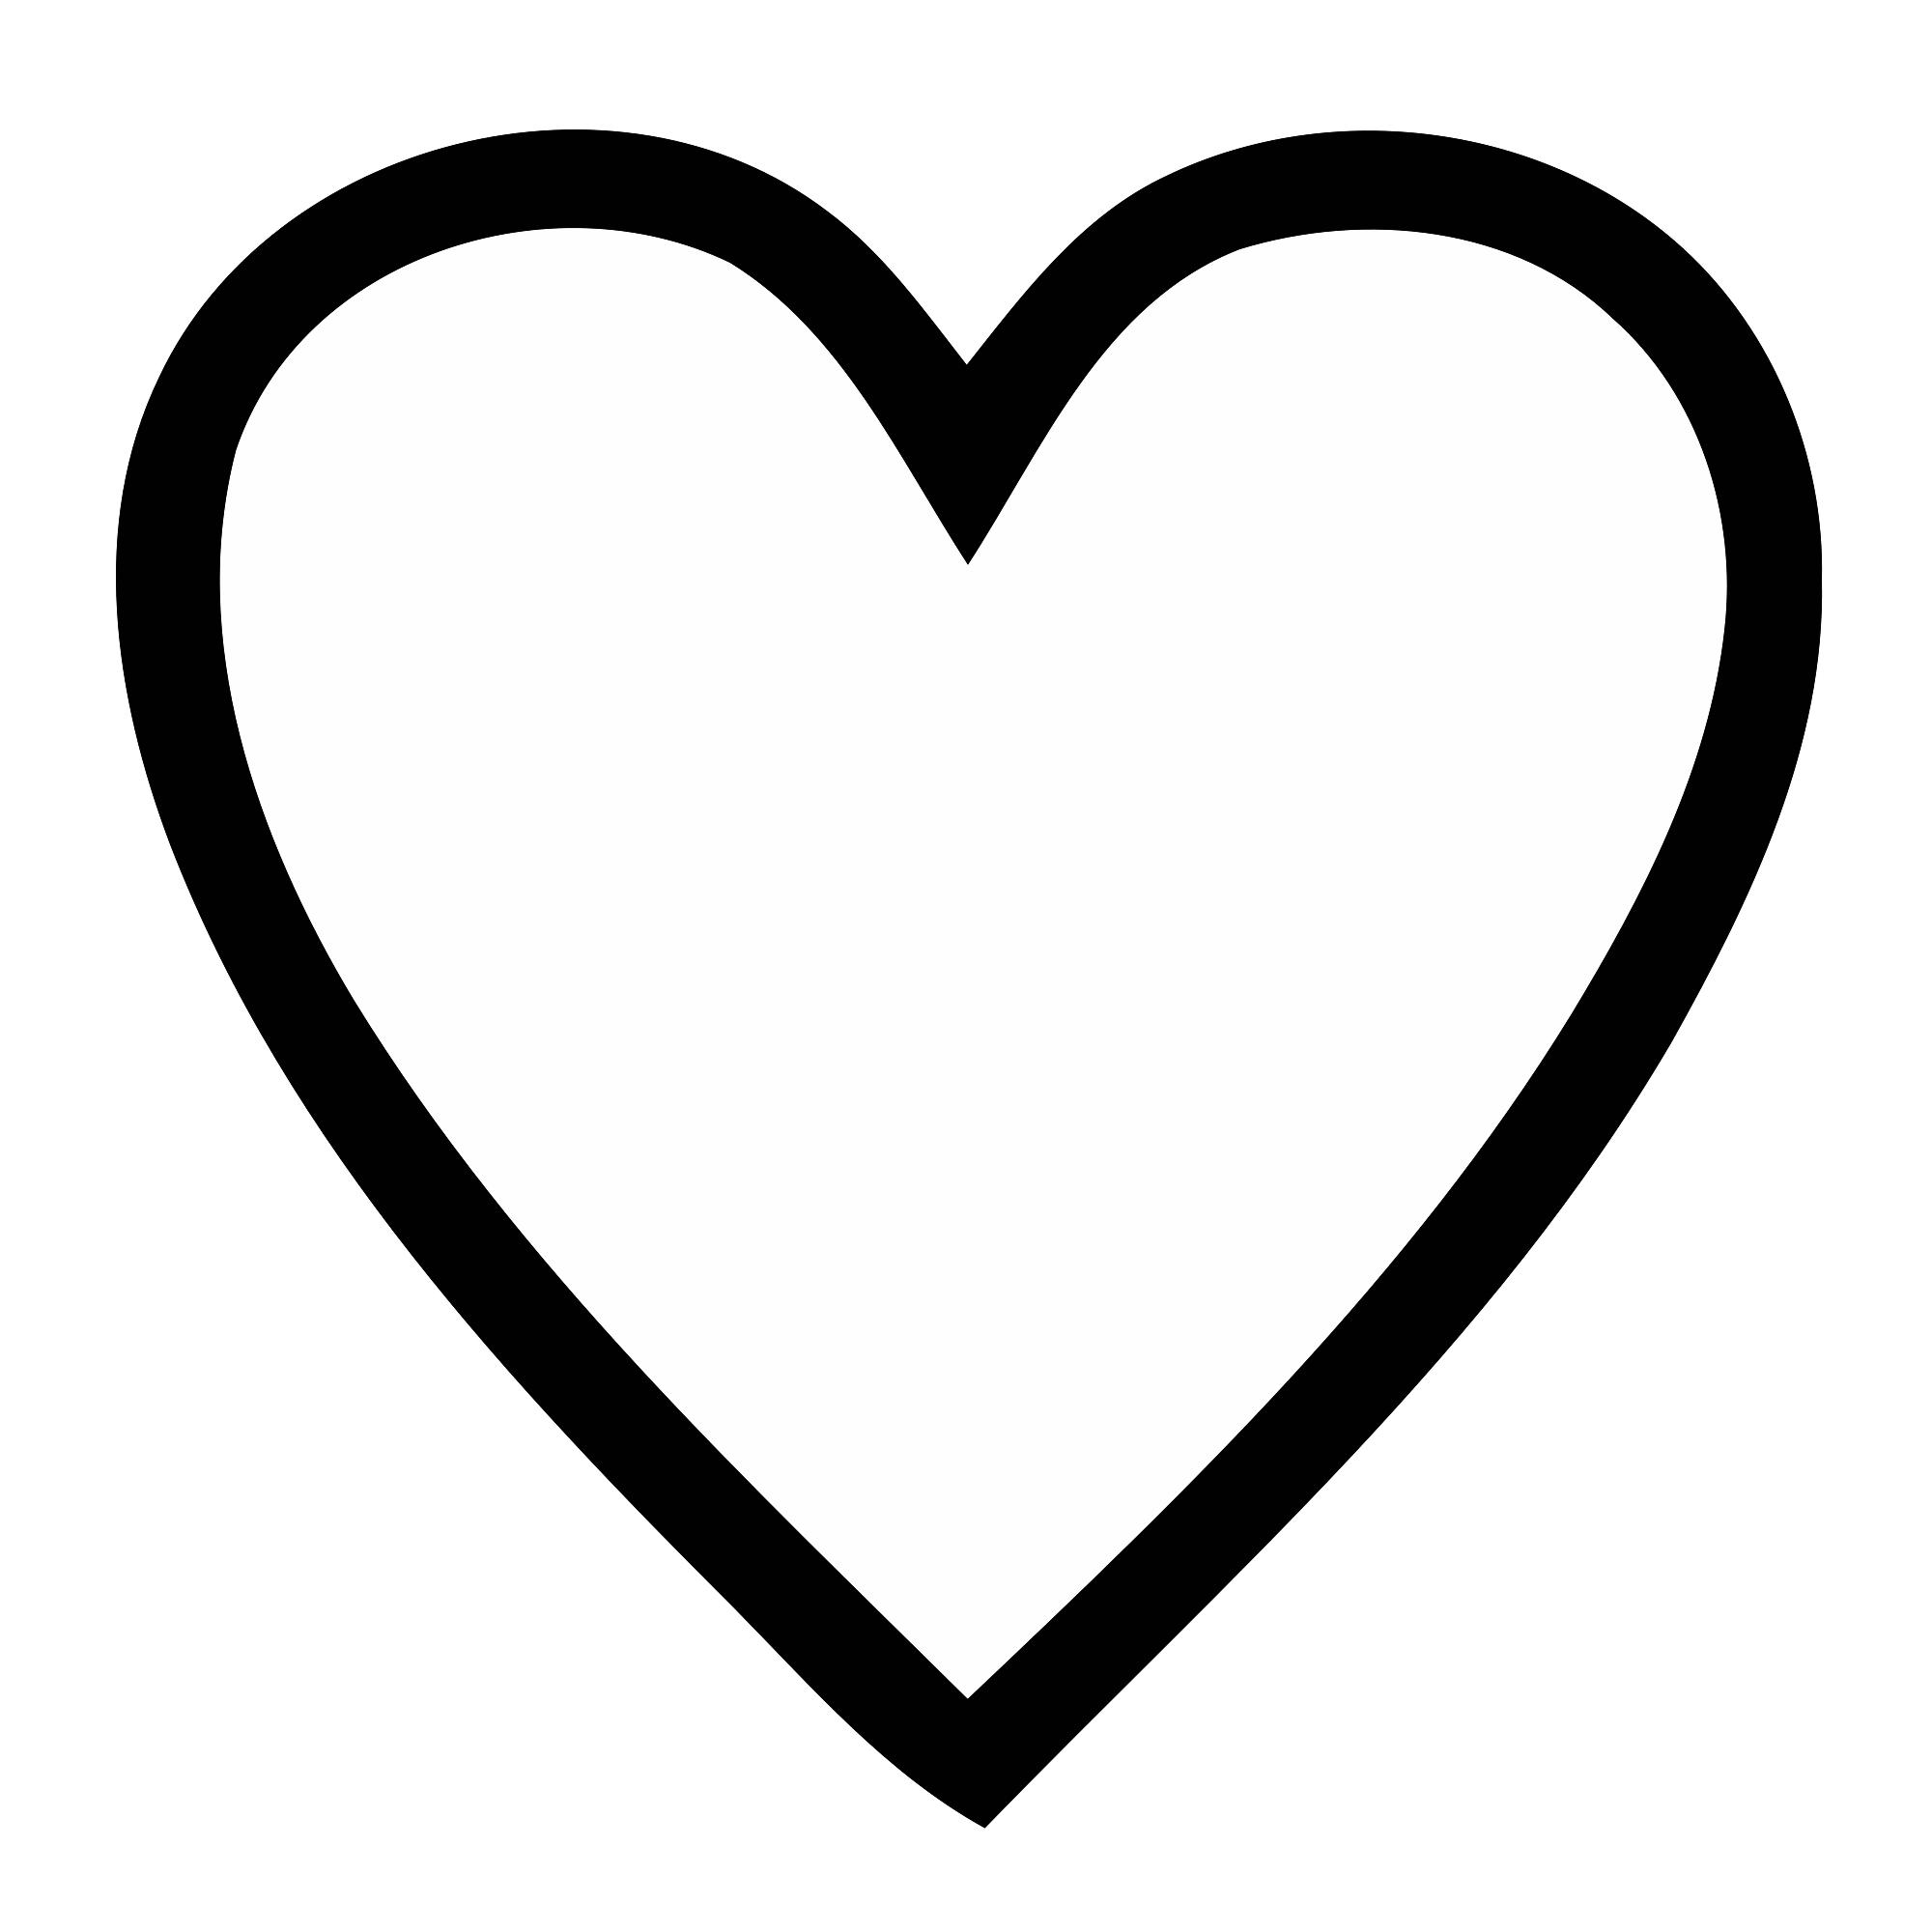 Heart Png Black Transparent